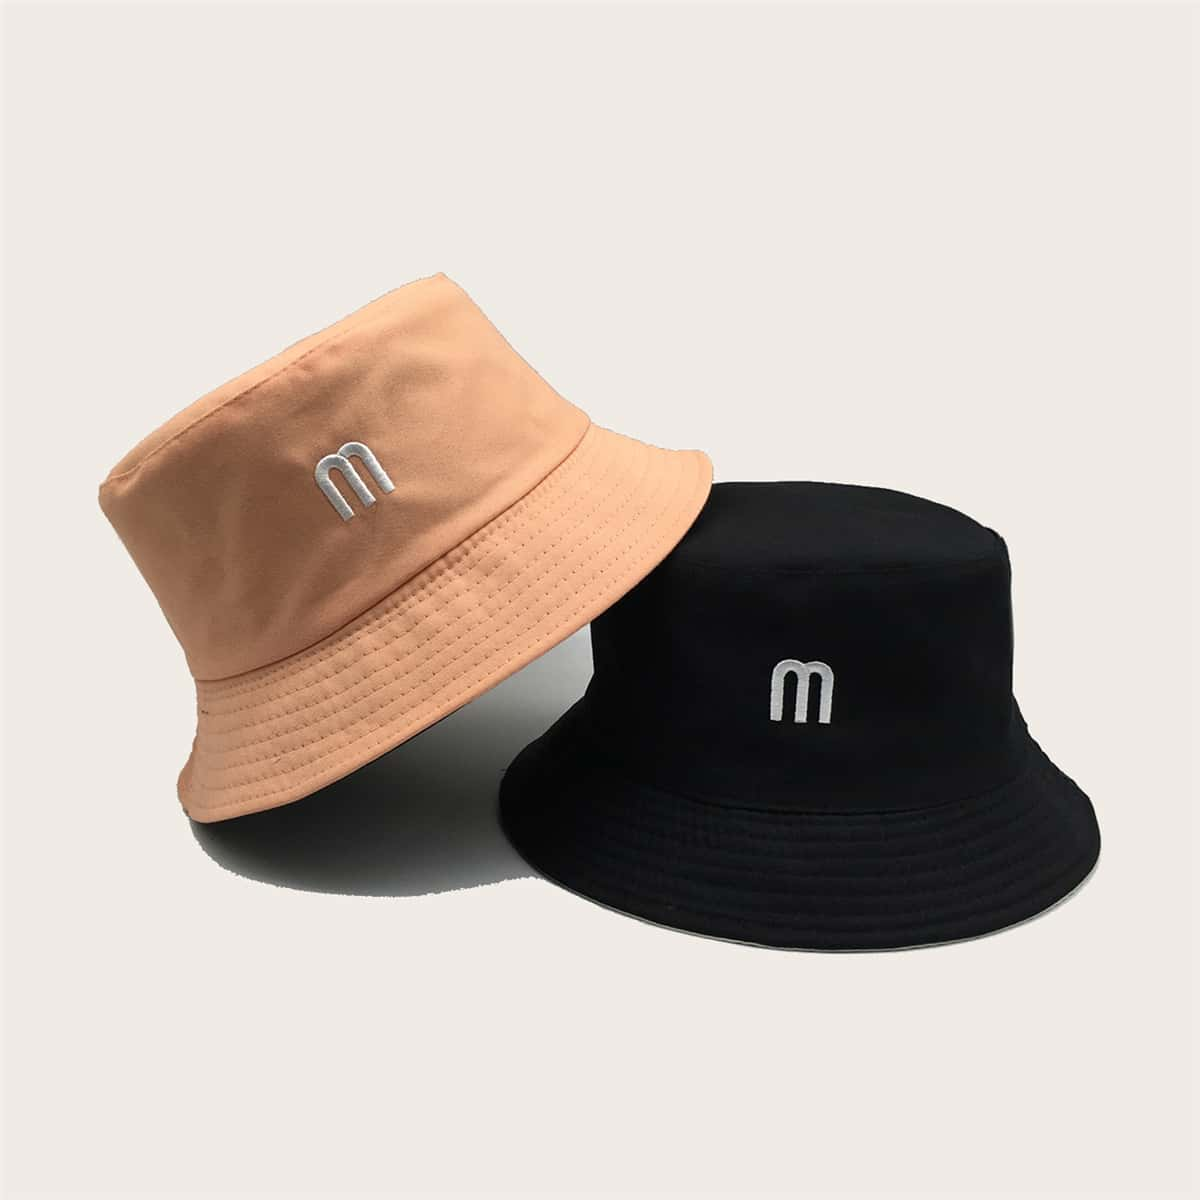 Шляпа ведра вышивки письма 2pcs